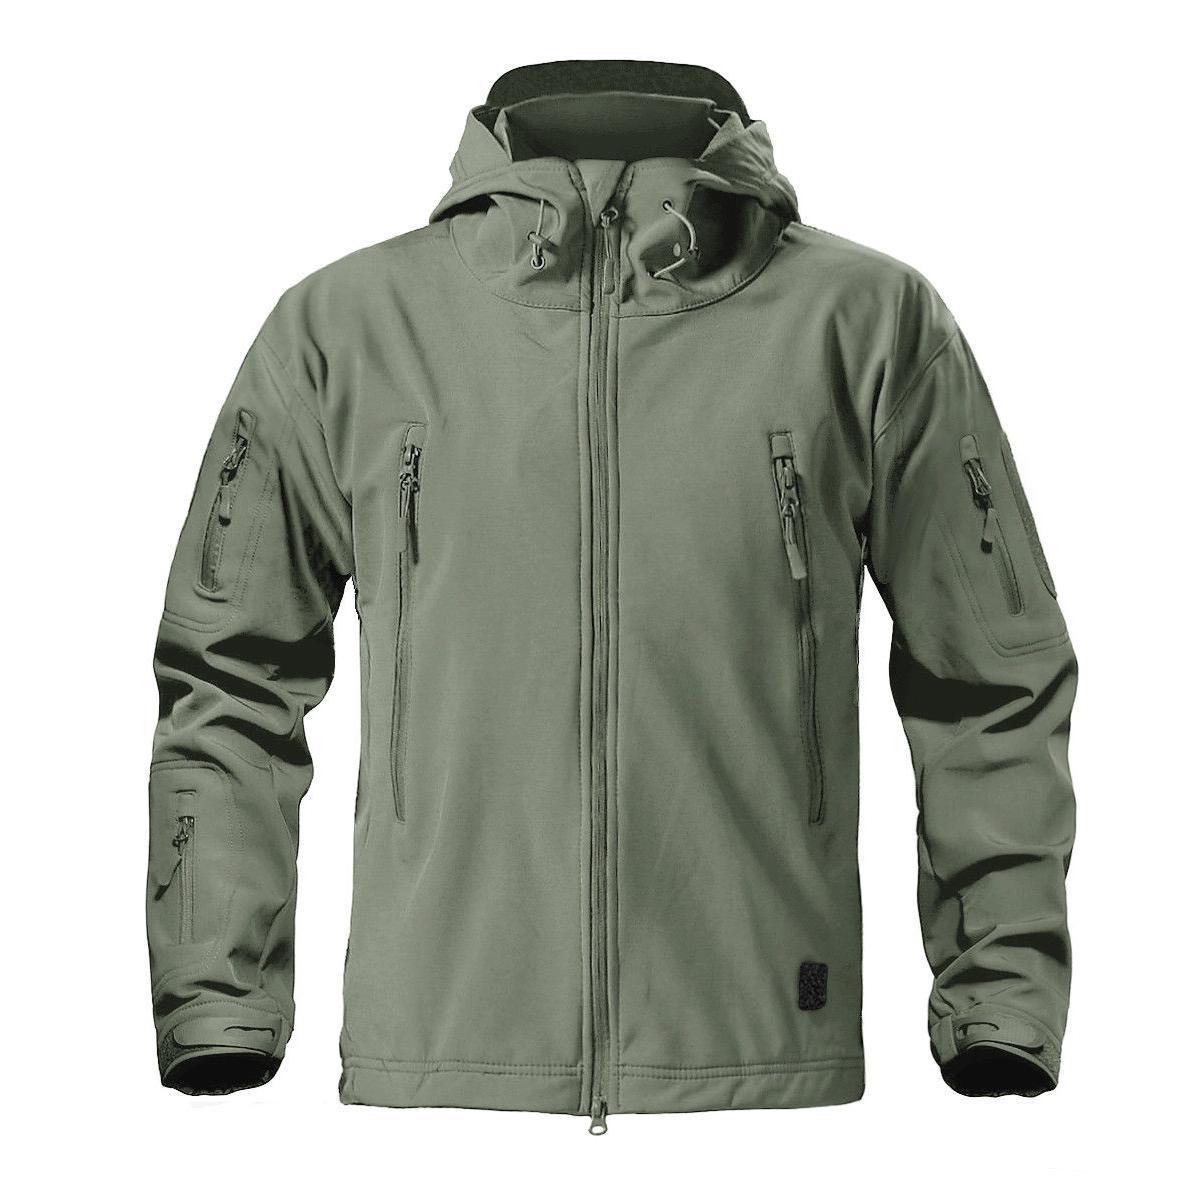 TACVASEN Jackets Coats Safari Tactical